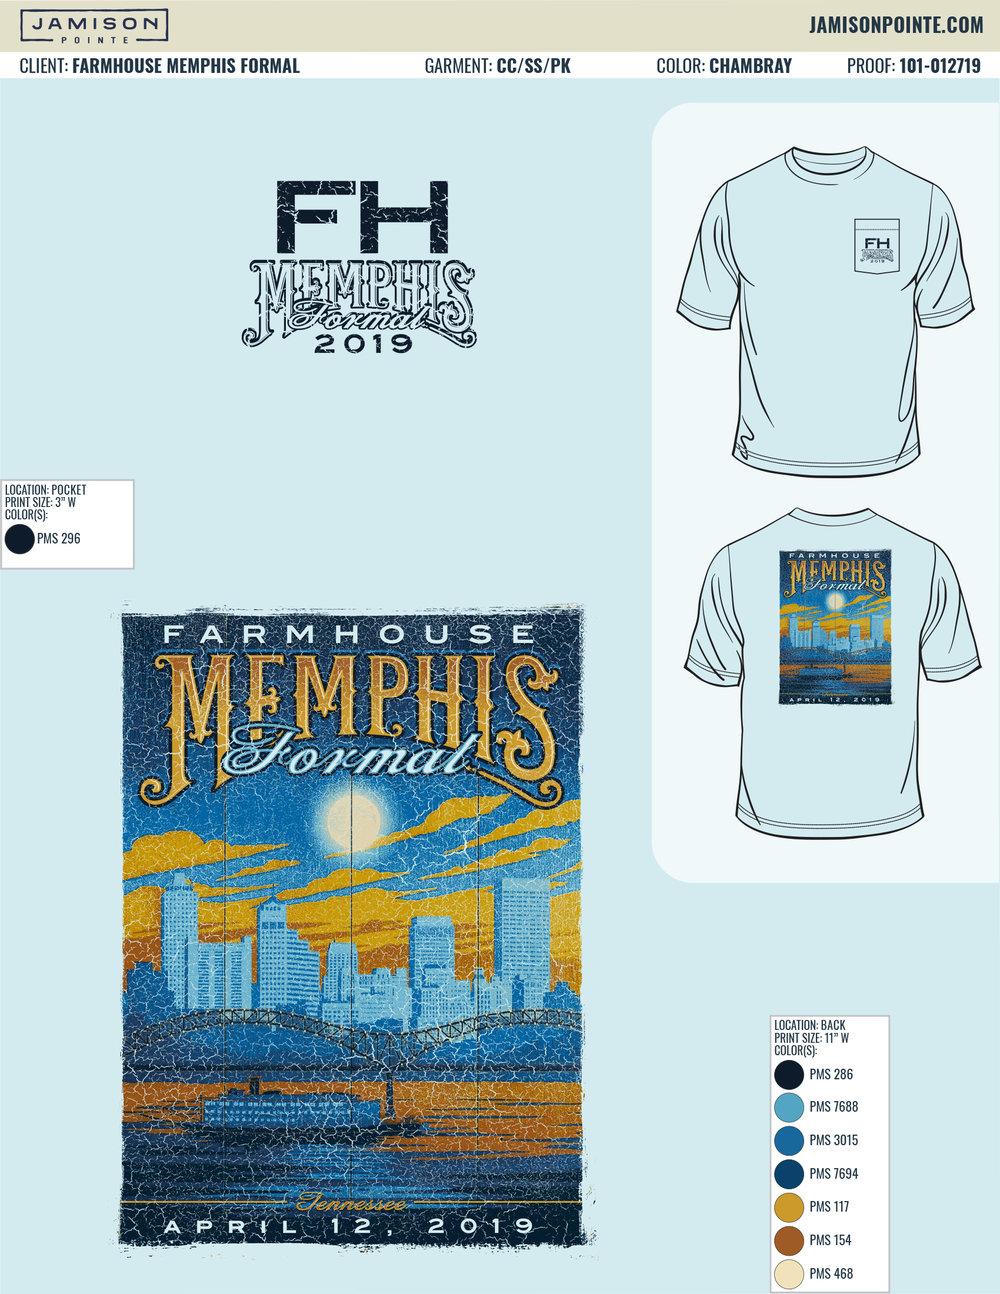 101-012719 Farmhouse Memphis Formal.jpg